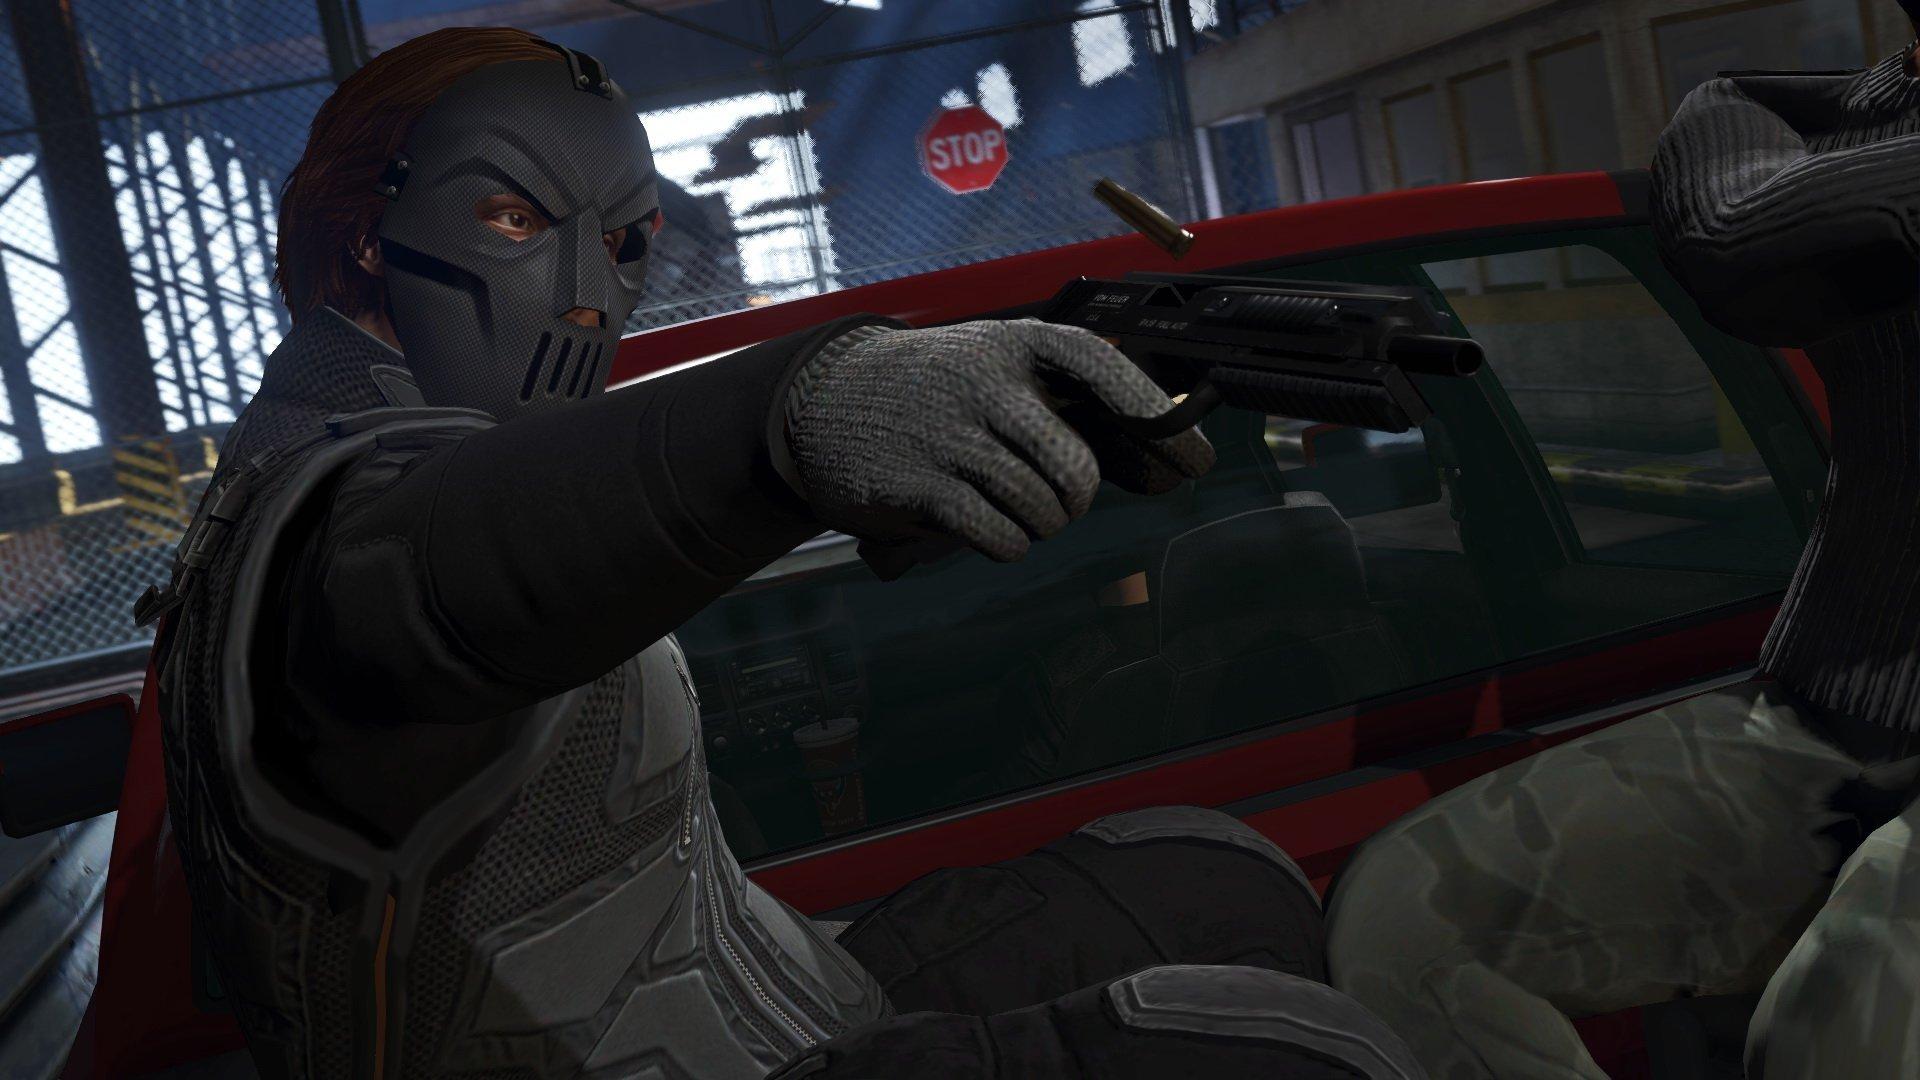 Grand Theft Auto V Full HD Fond d'écran and Arrière-Plan | 1920x1080 | ID:561750